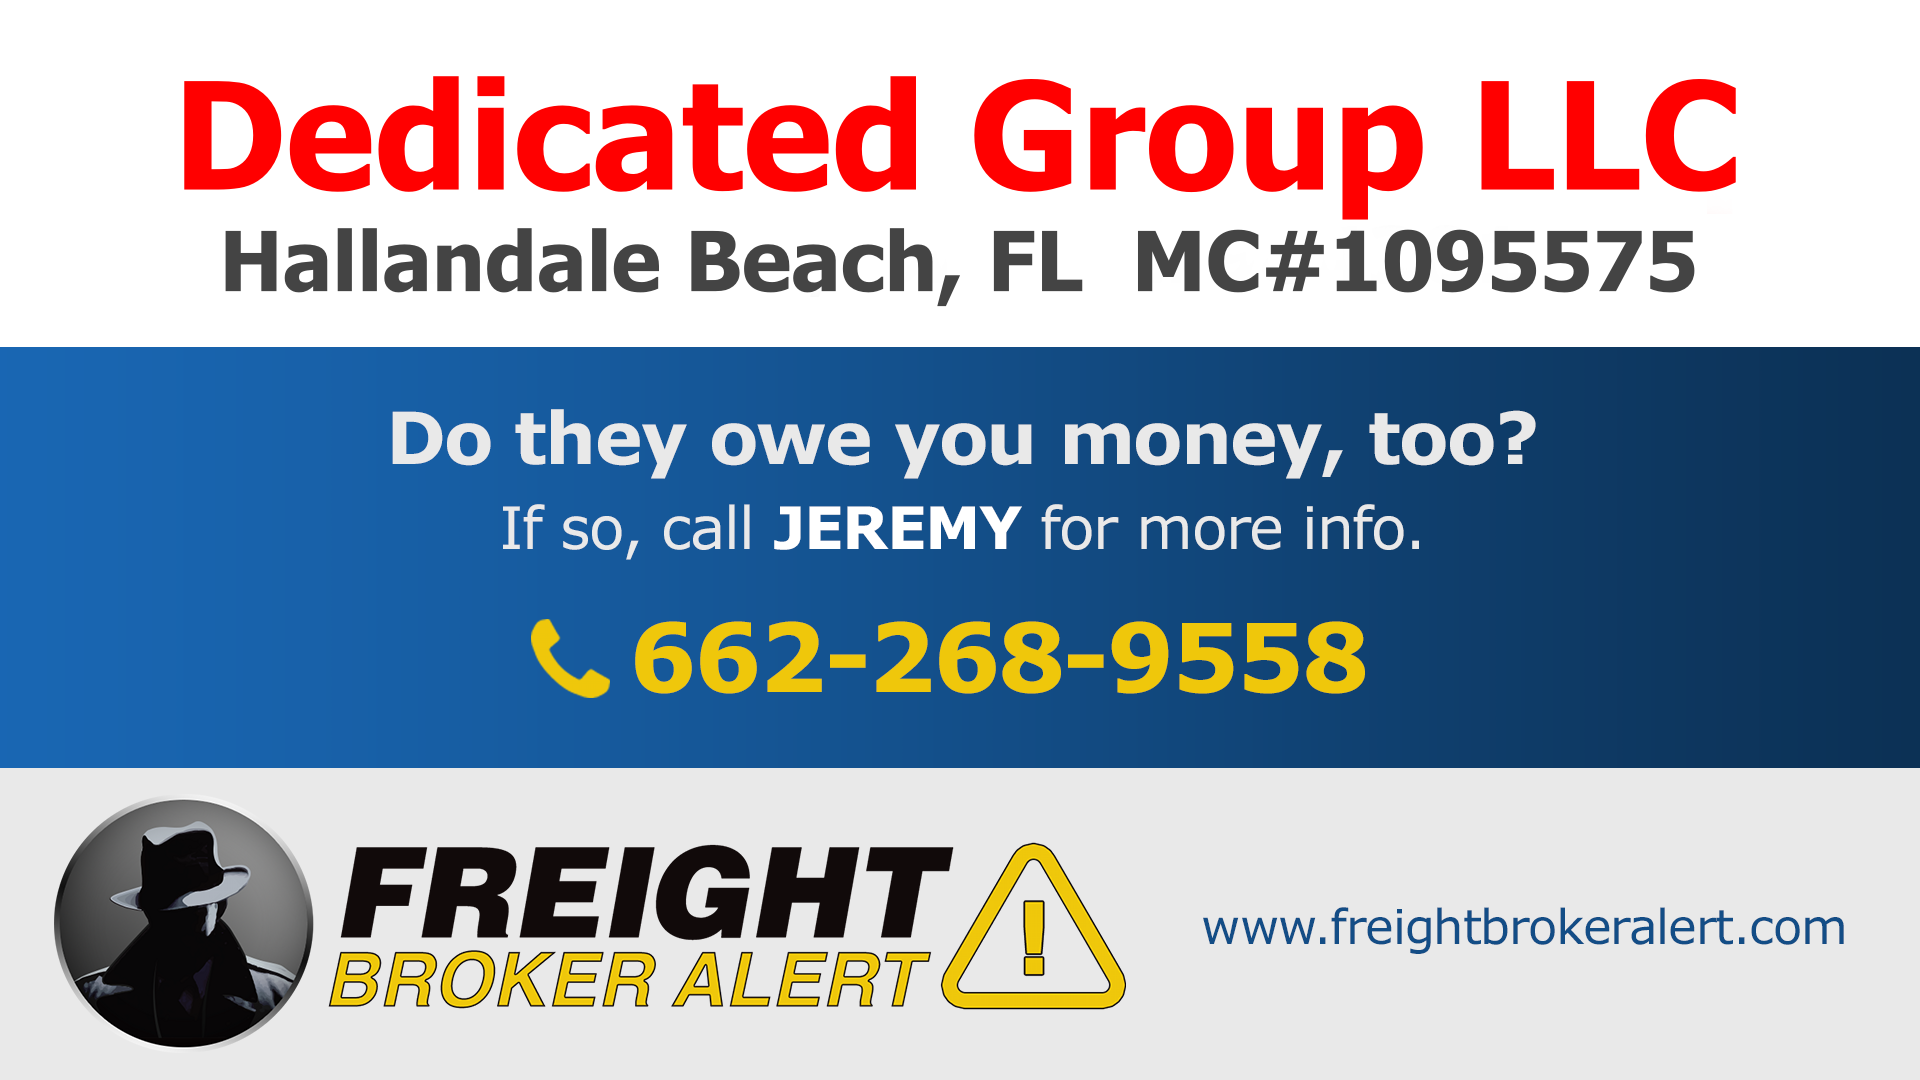 Dedicated Group LLC Florida